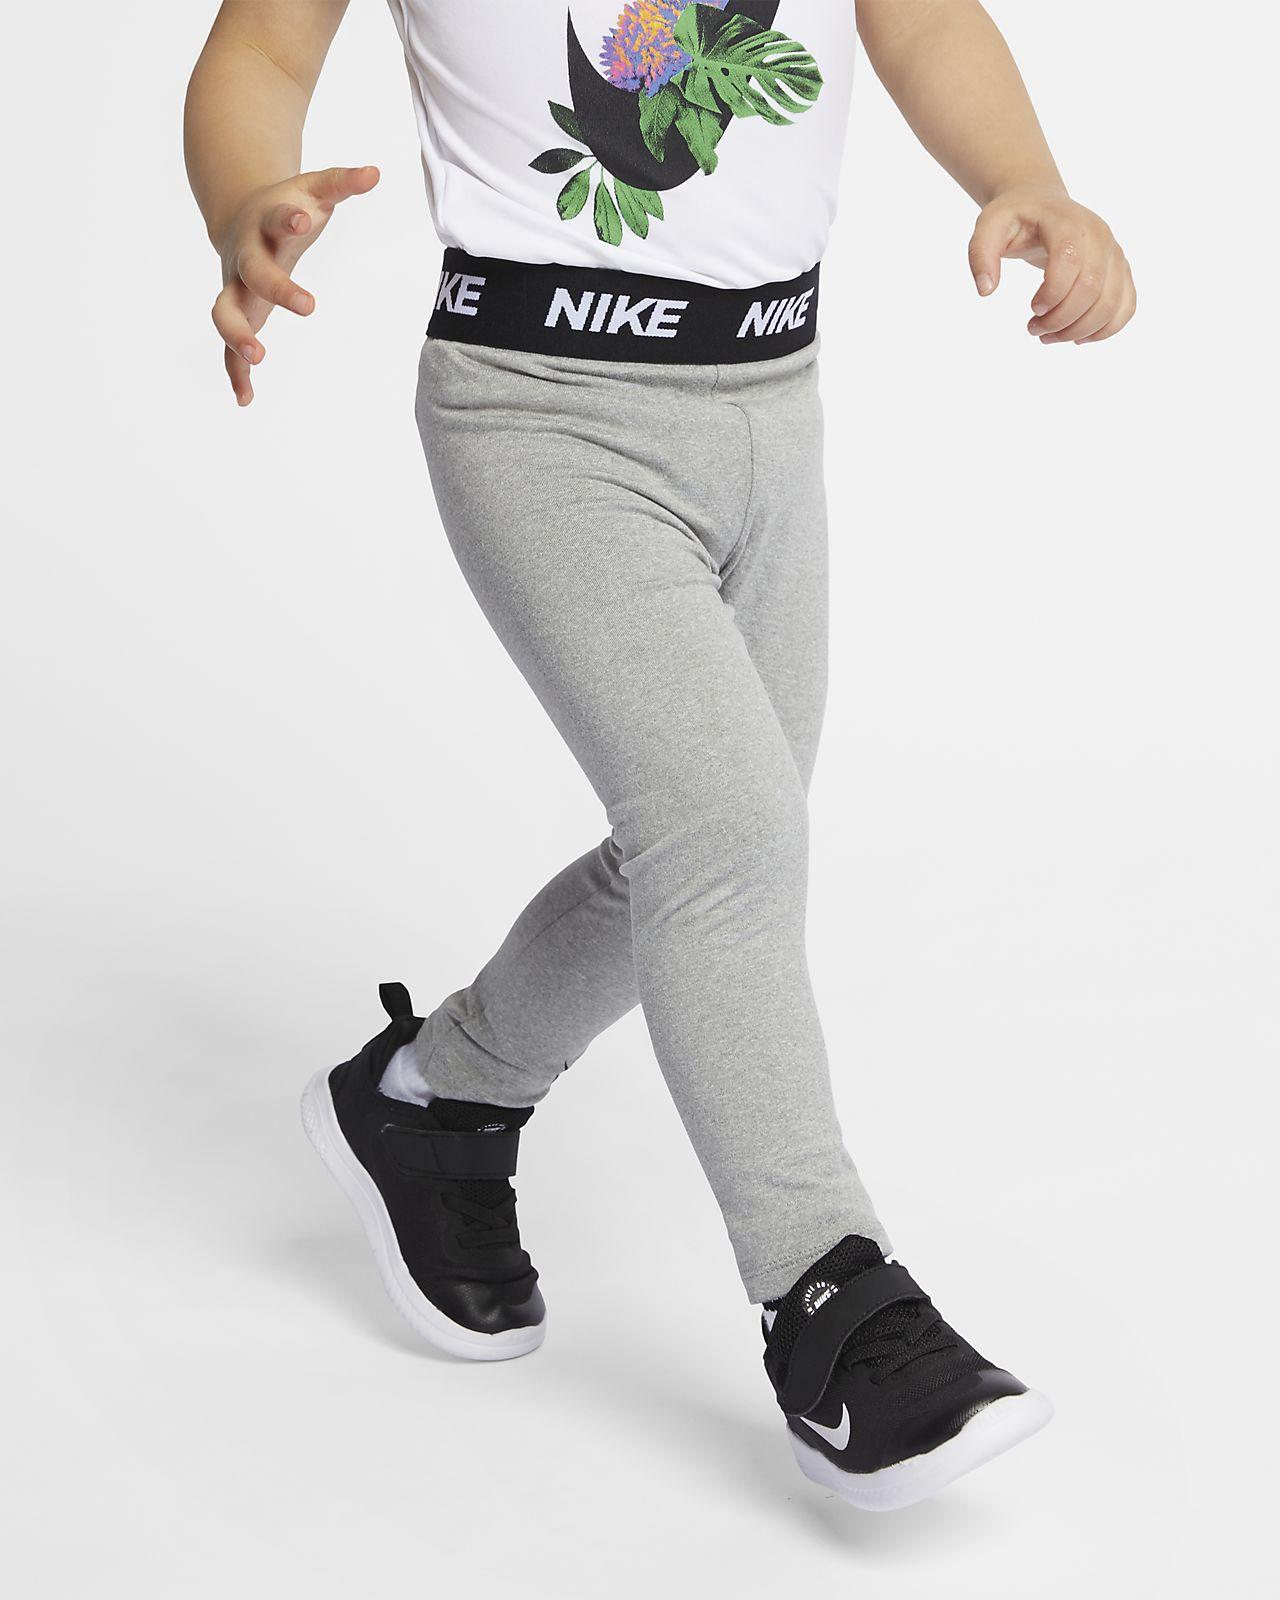 efccda9d4 Nike Sport Essentials Toddler Printed Leggings. Nike.com